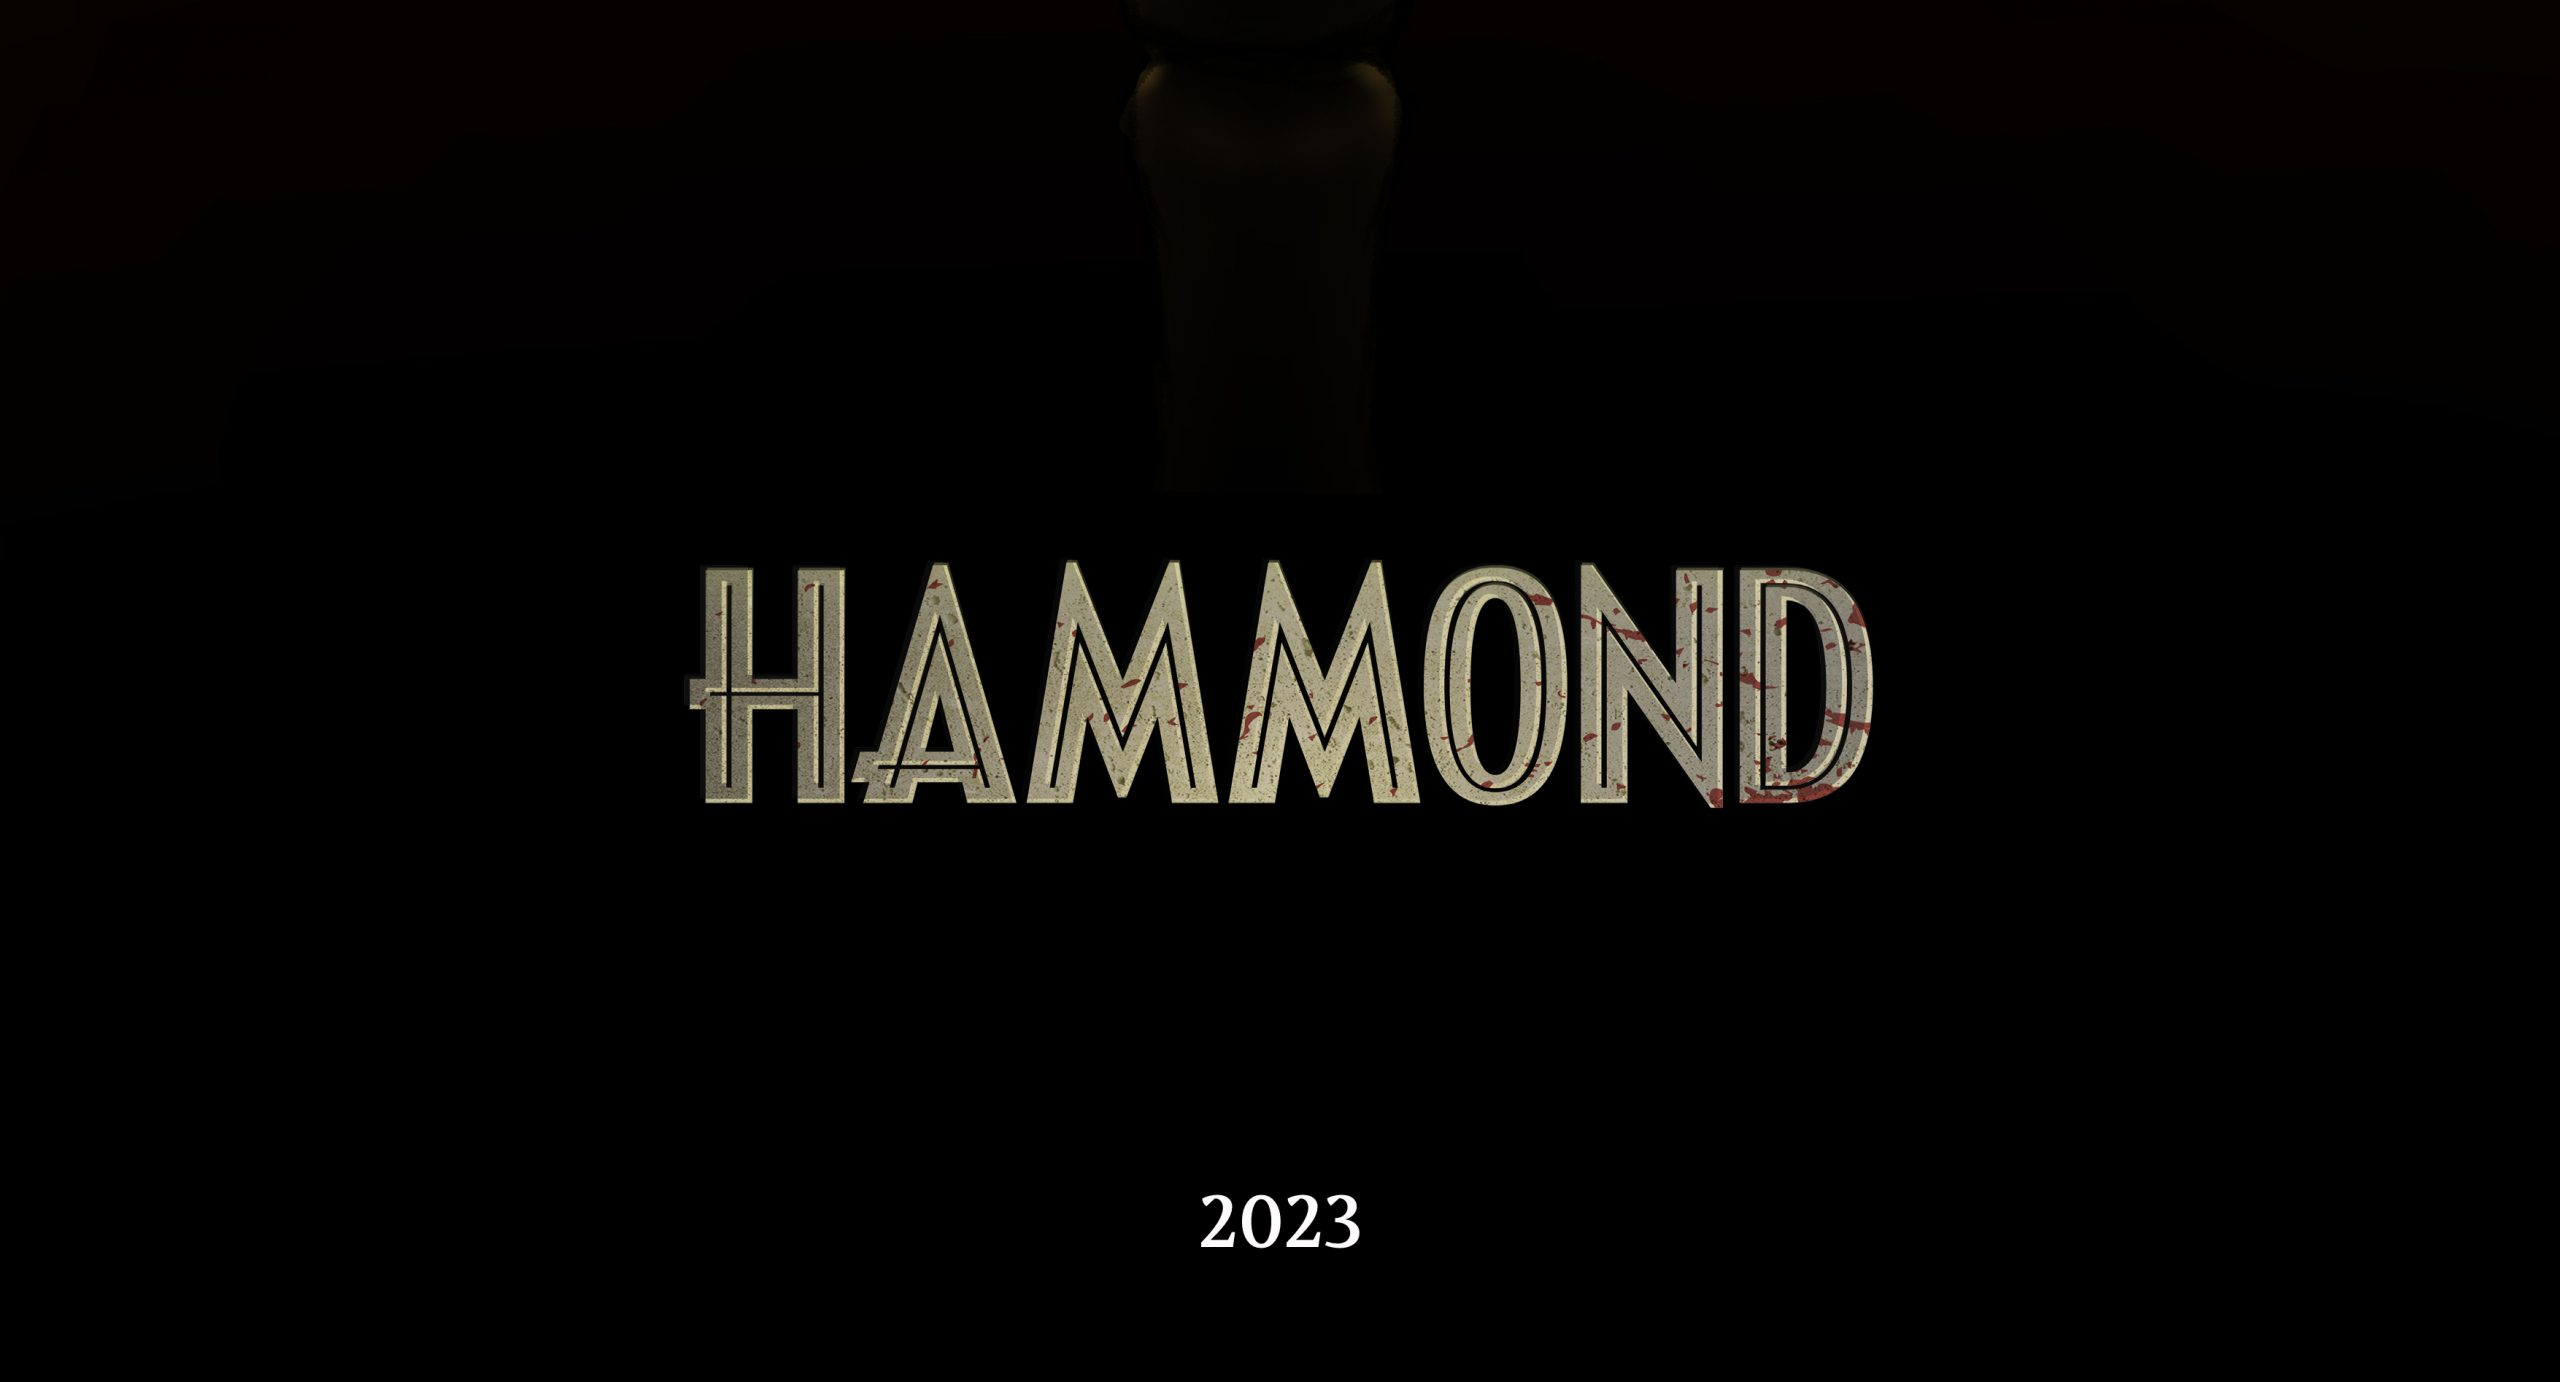 Independent Writers Pitch 'John Hammond' Prequel Story